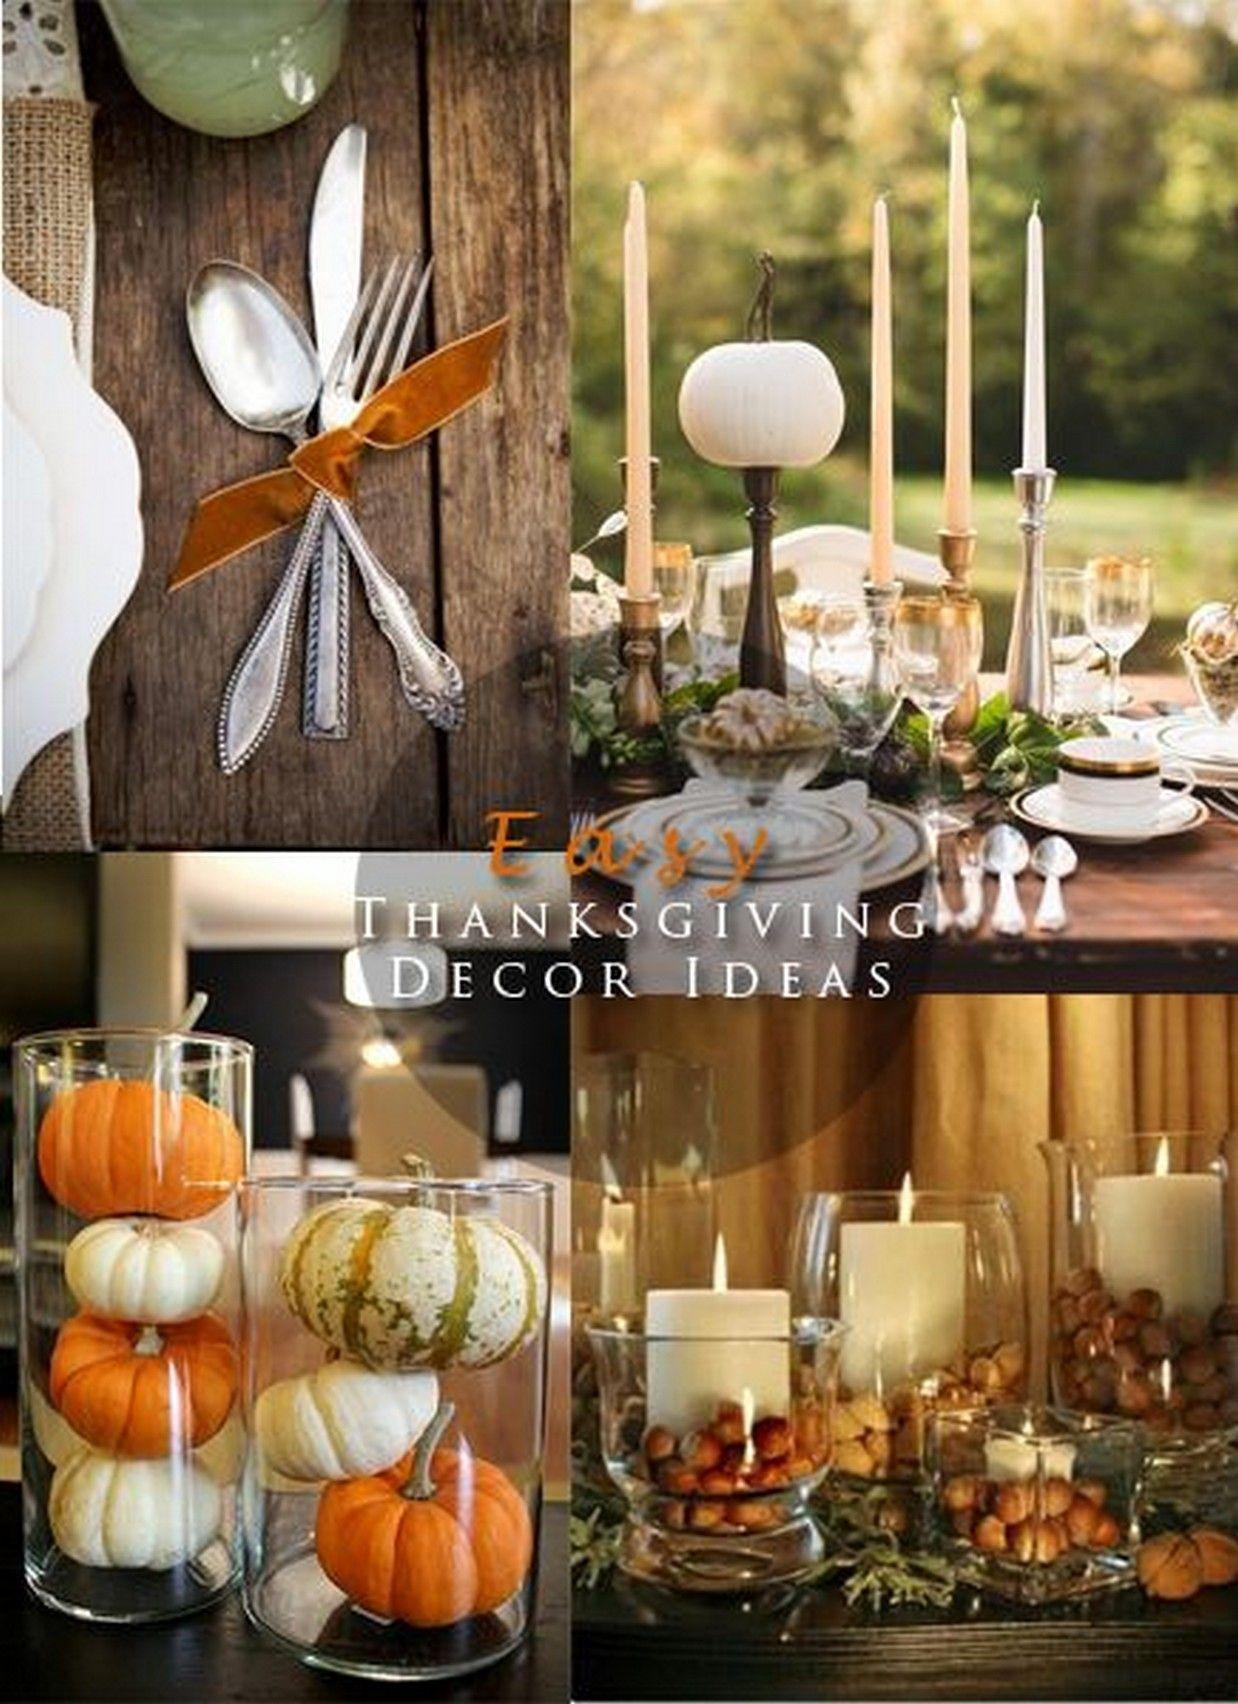 DIY Thanksgiving Decor Pinterest  pinterest decorating ideas